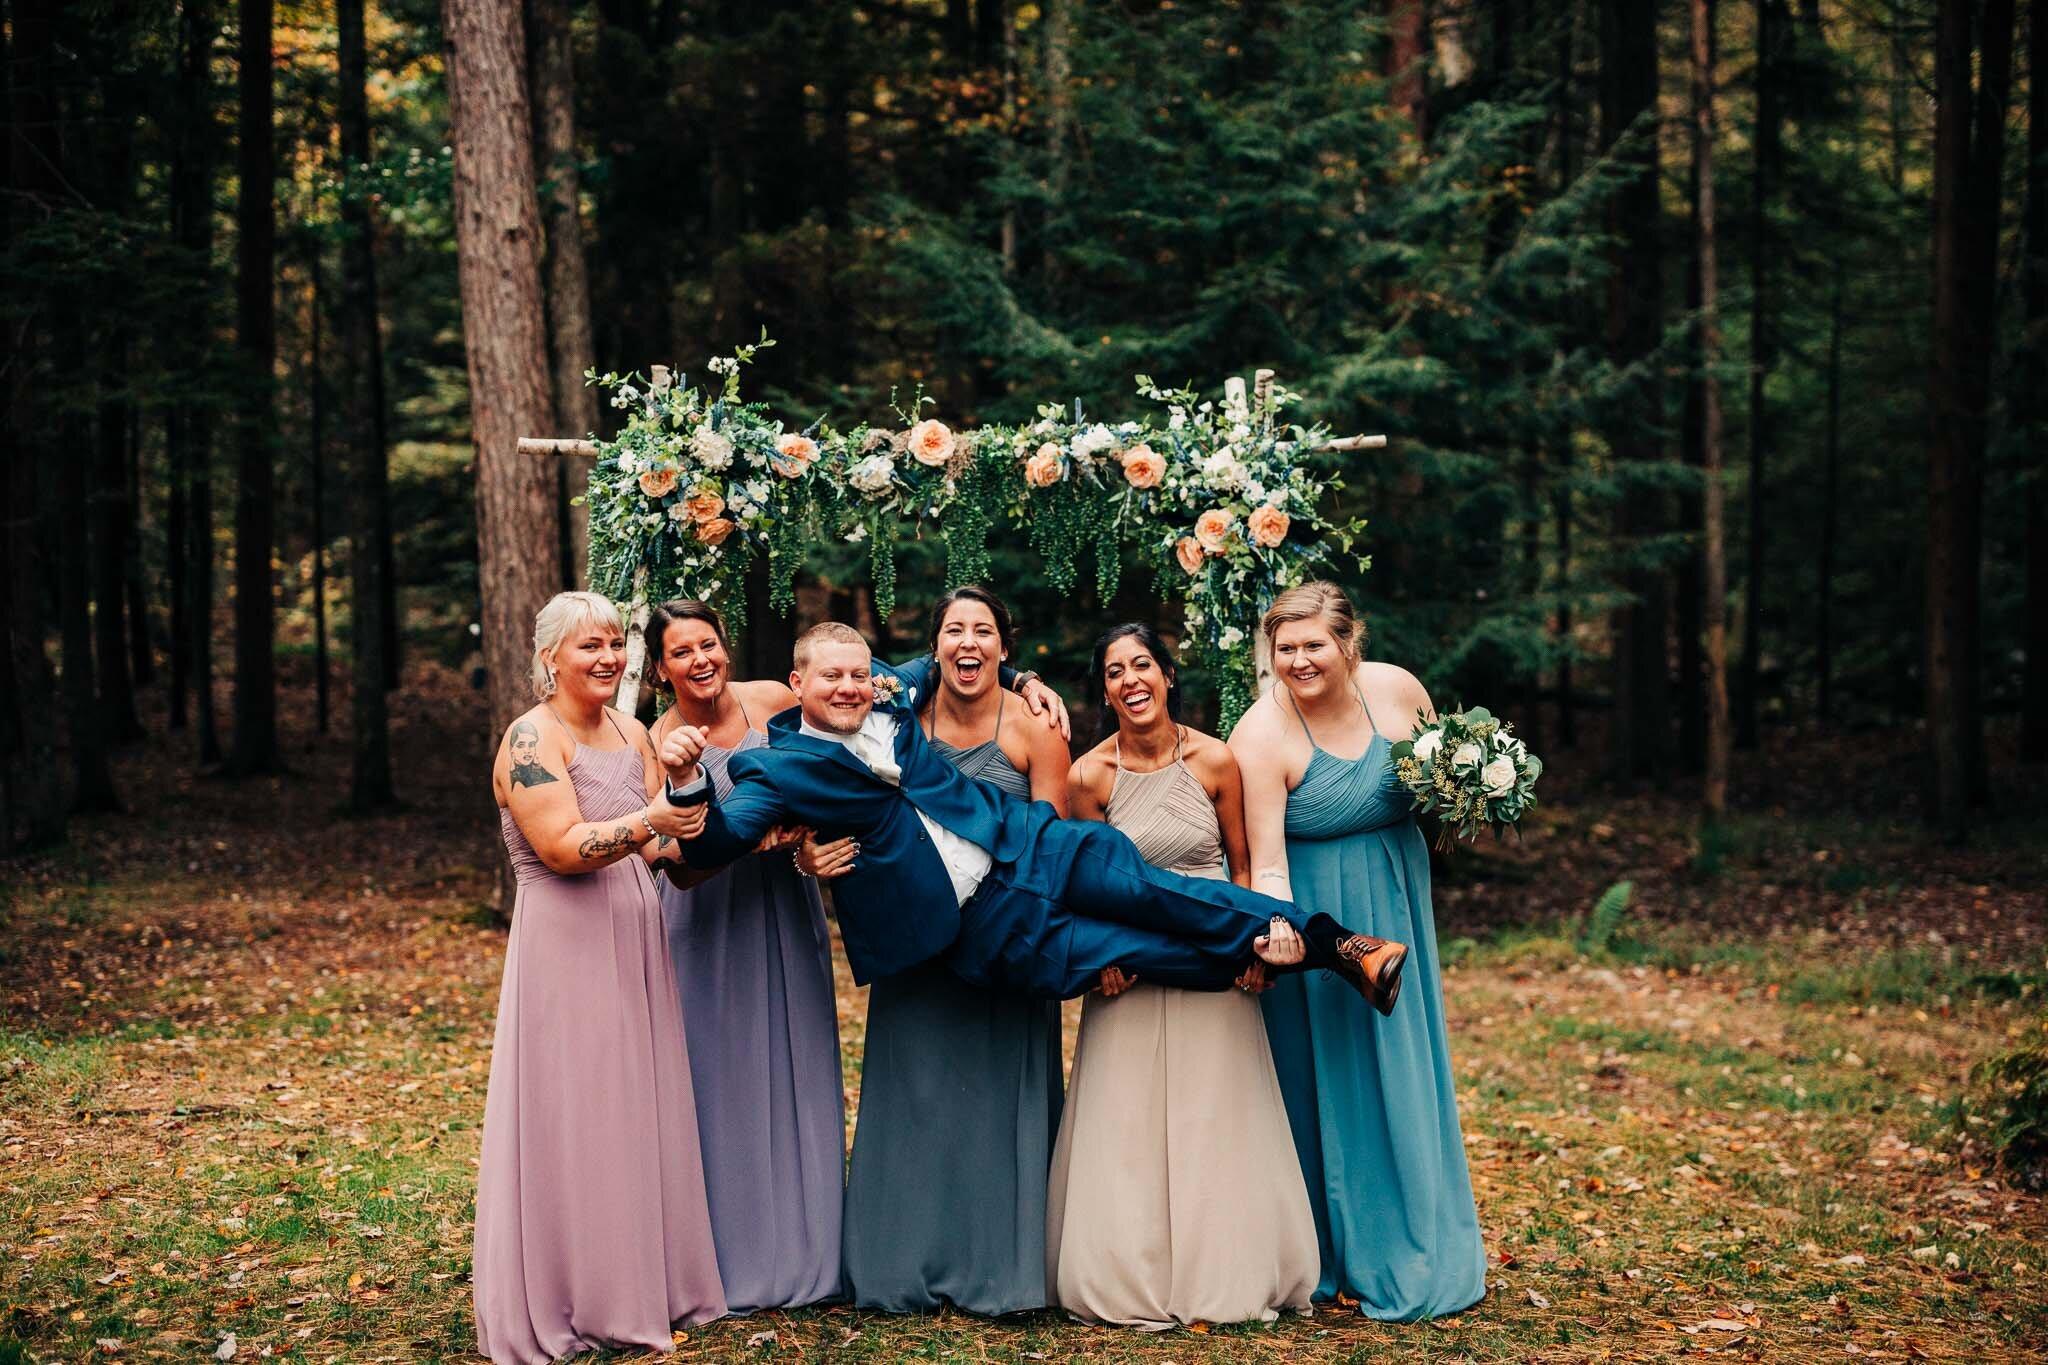 whitewoods-fall-wedding-8233.jpg